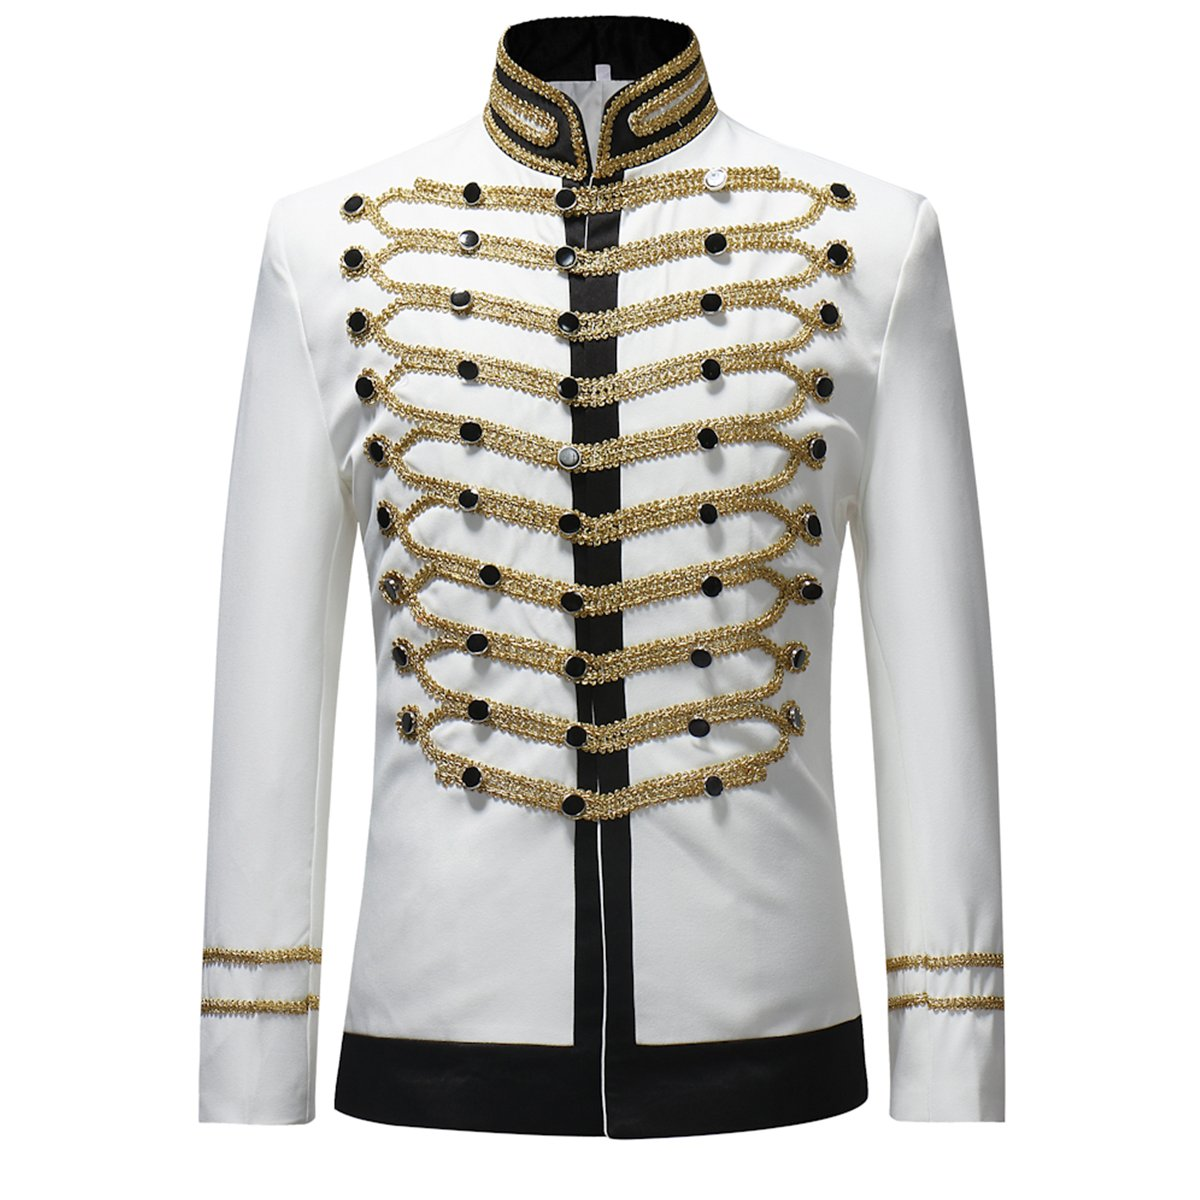 Cloudstyle Mens Suits Notched Lapel Wedding Party Blazer Dinner Vintage Jacket